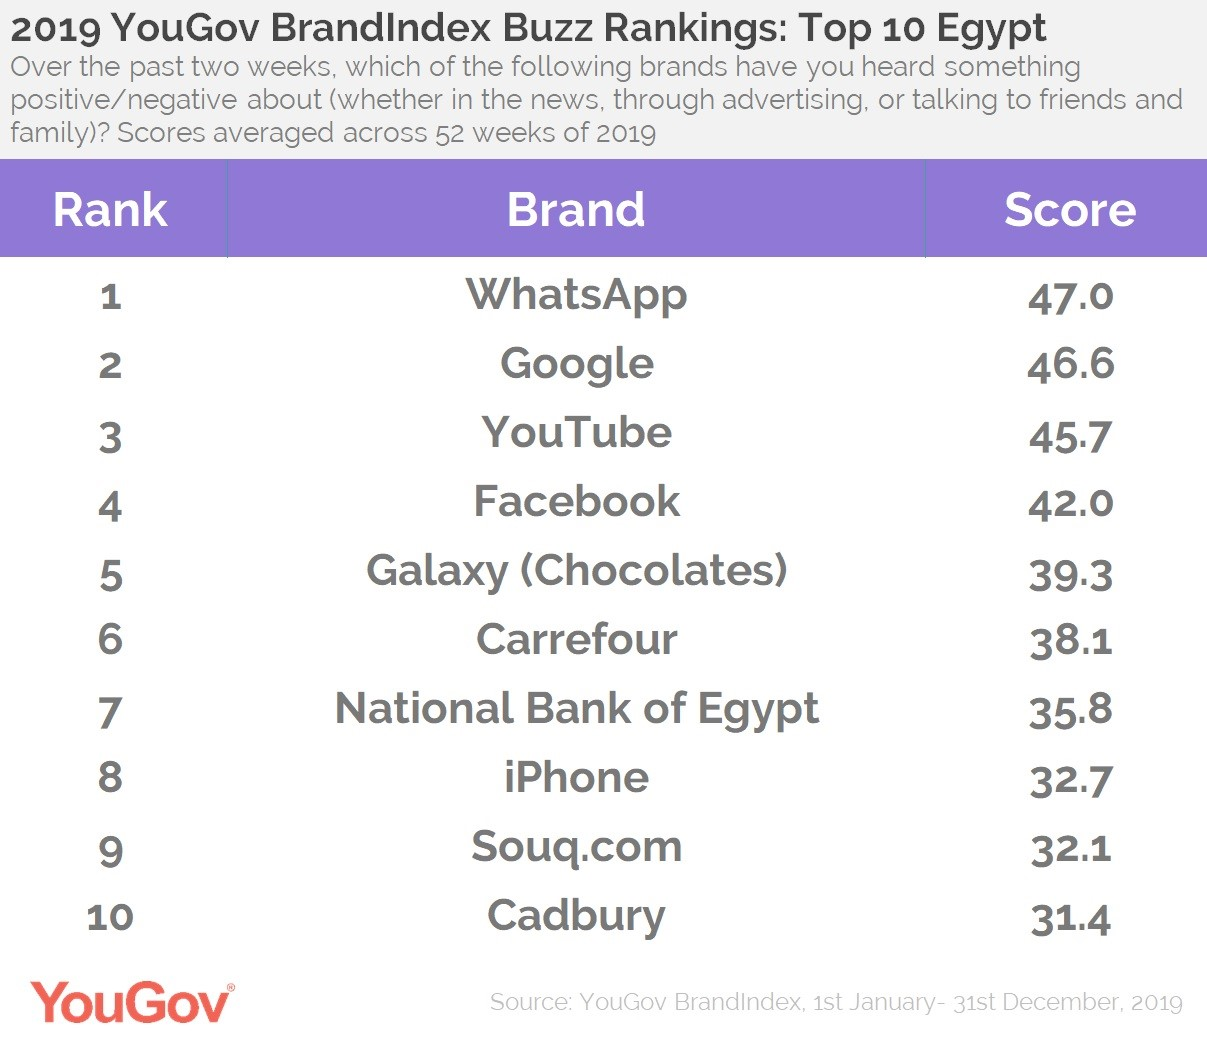 Buzz Rankings- Egypt Top 10